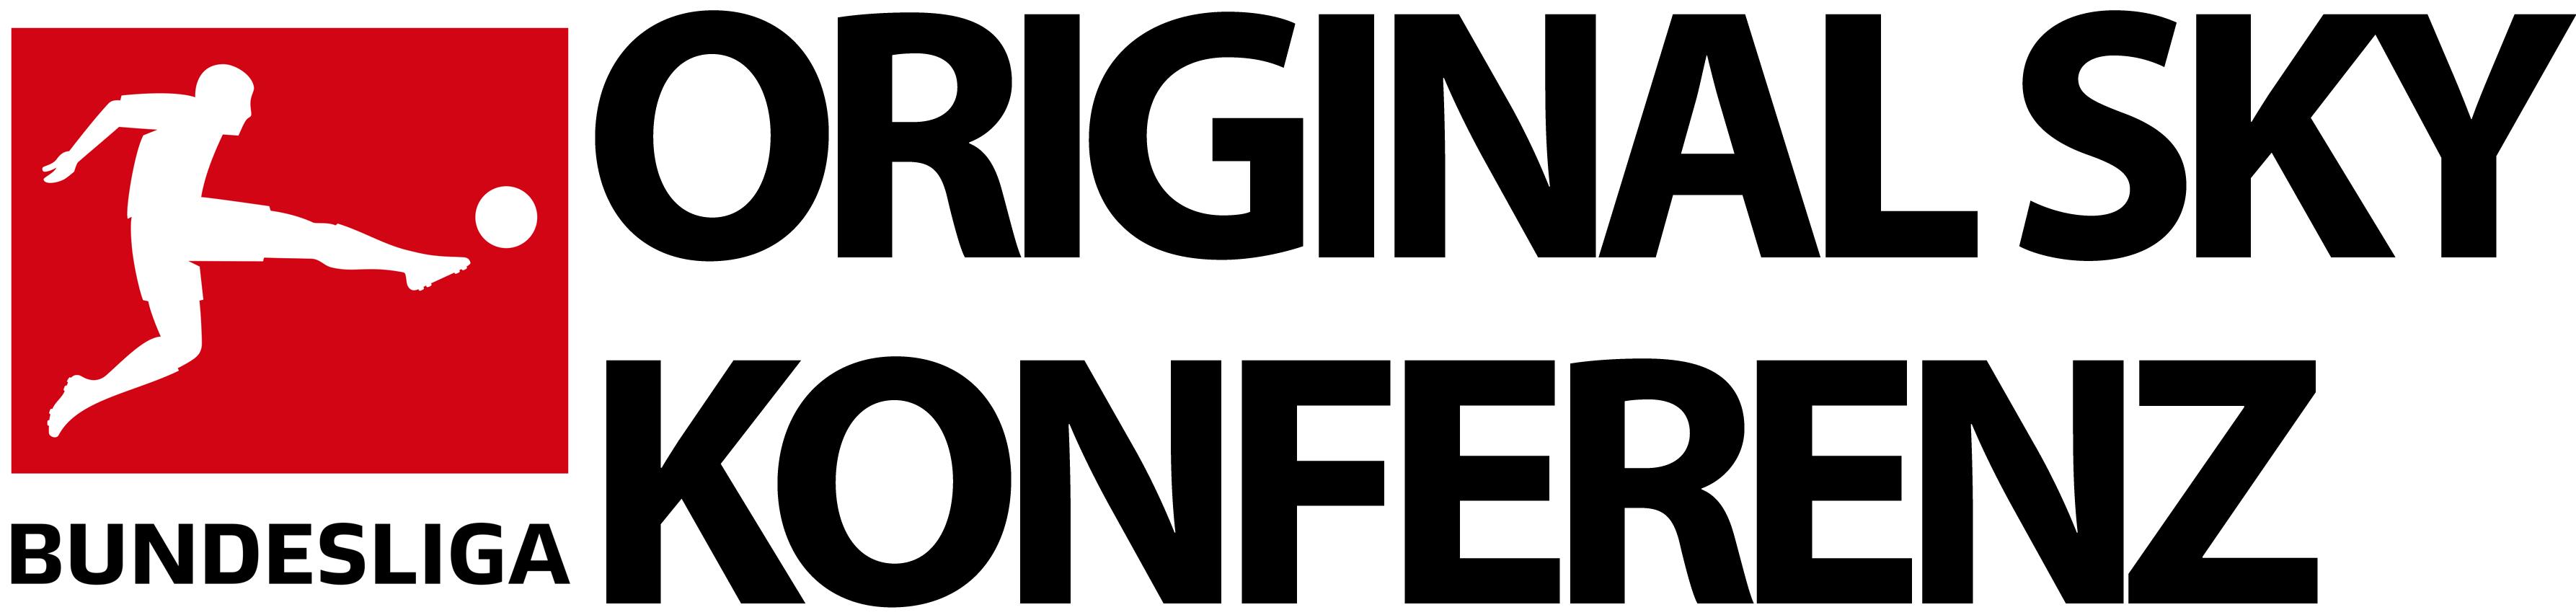 Sky Bundesliga Konferenz